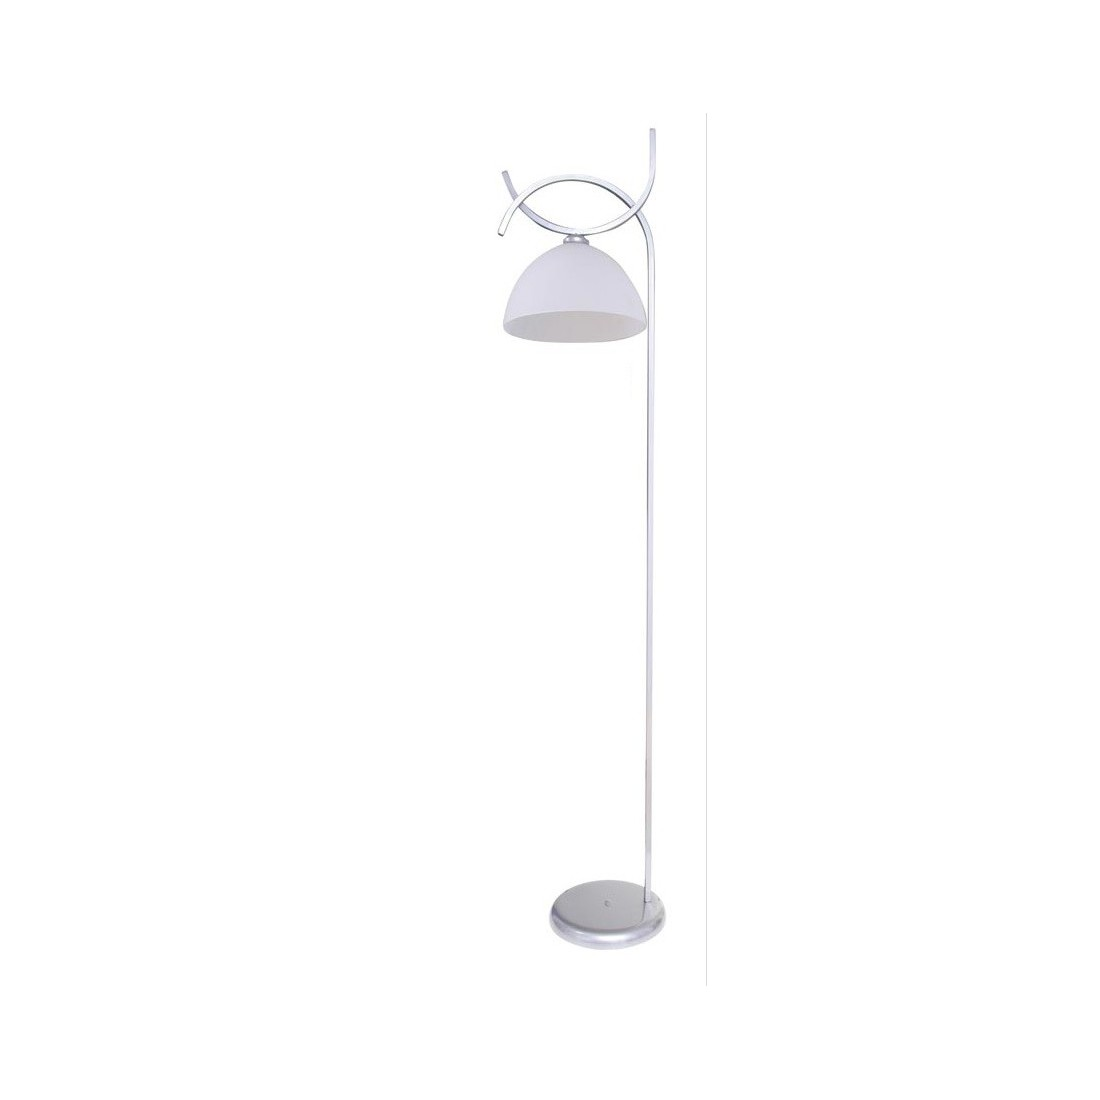 Lamparas infantiles lamparas dormitorio ni o lamparas - Lamparas para habitaciones infantiles ...